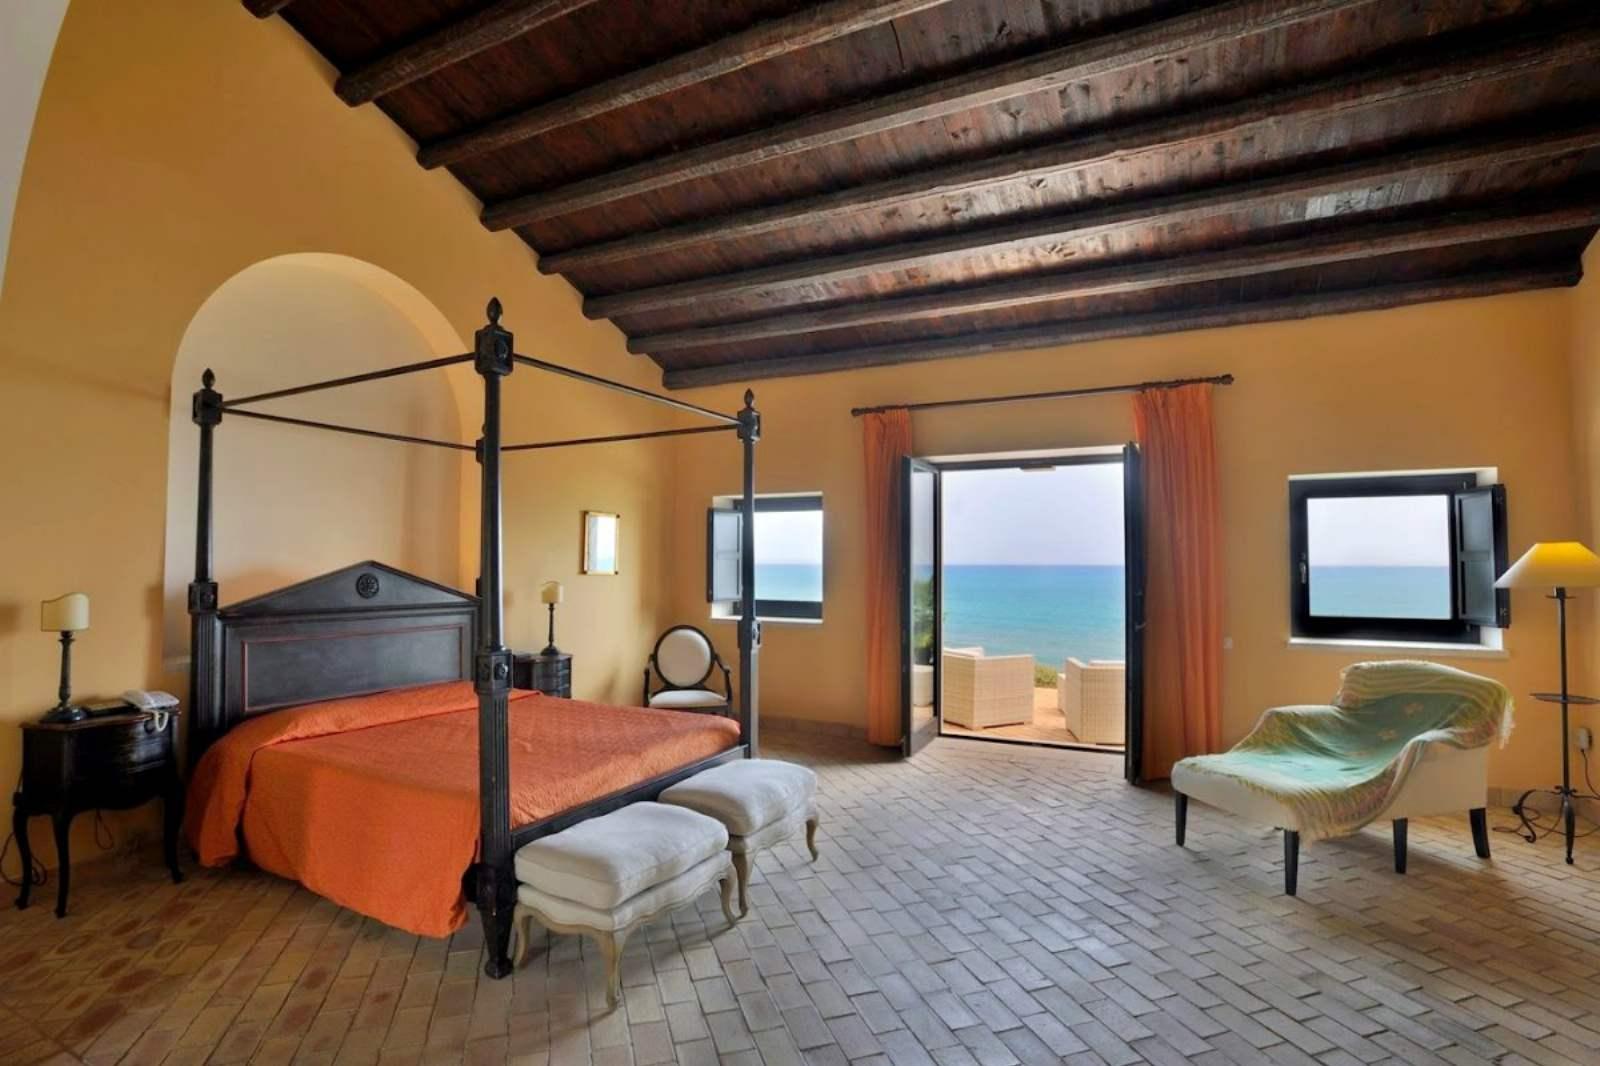 Falconara Resort & Spa: room / property / locale photo. Image 3